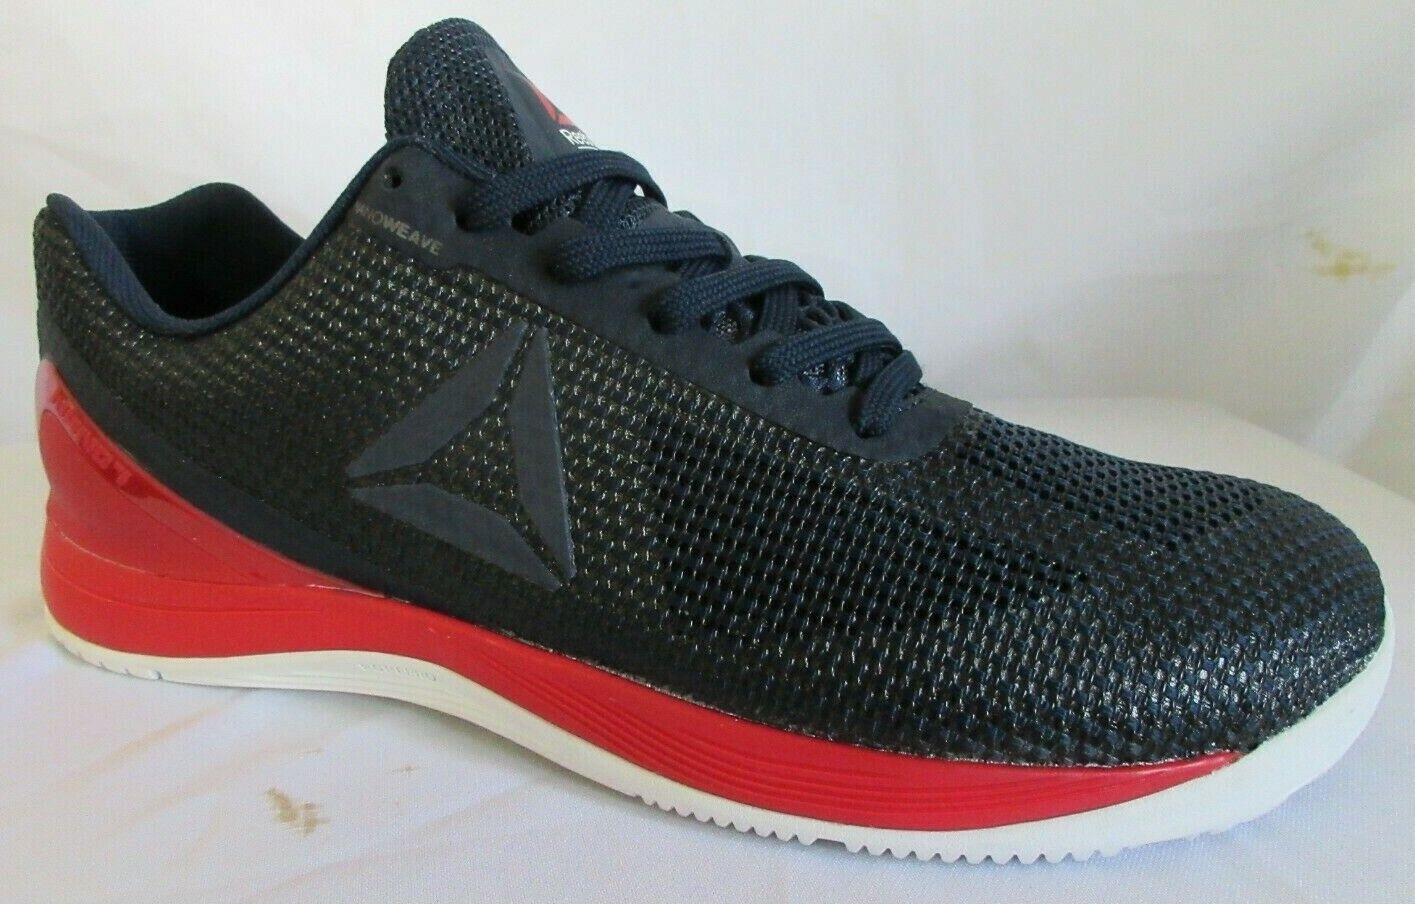 Reebok Cross Fit Nano 7.0 blu  Men Running scarpe 10  negozi al dettaglio